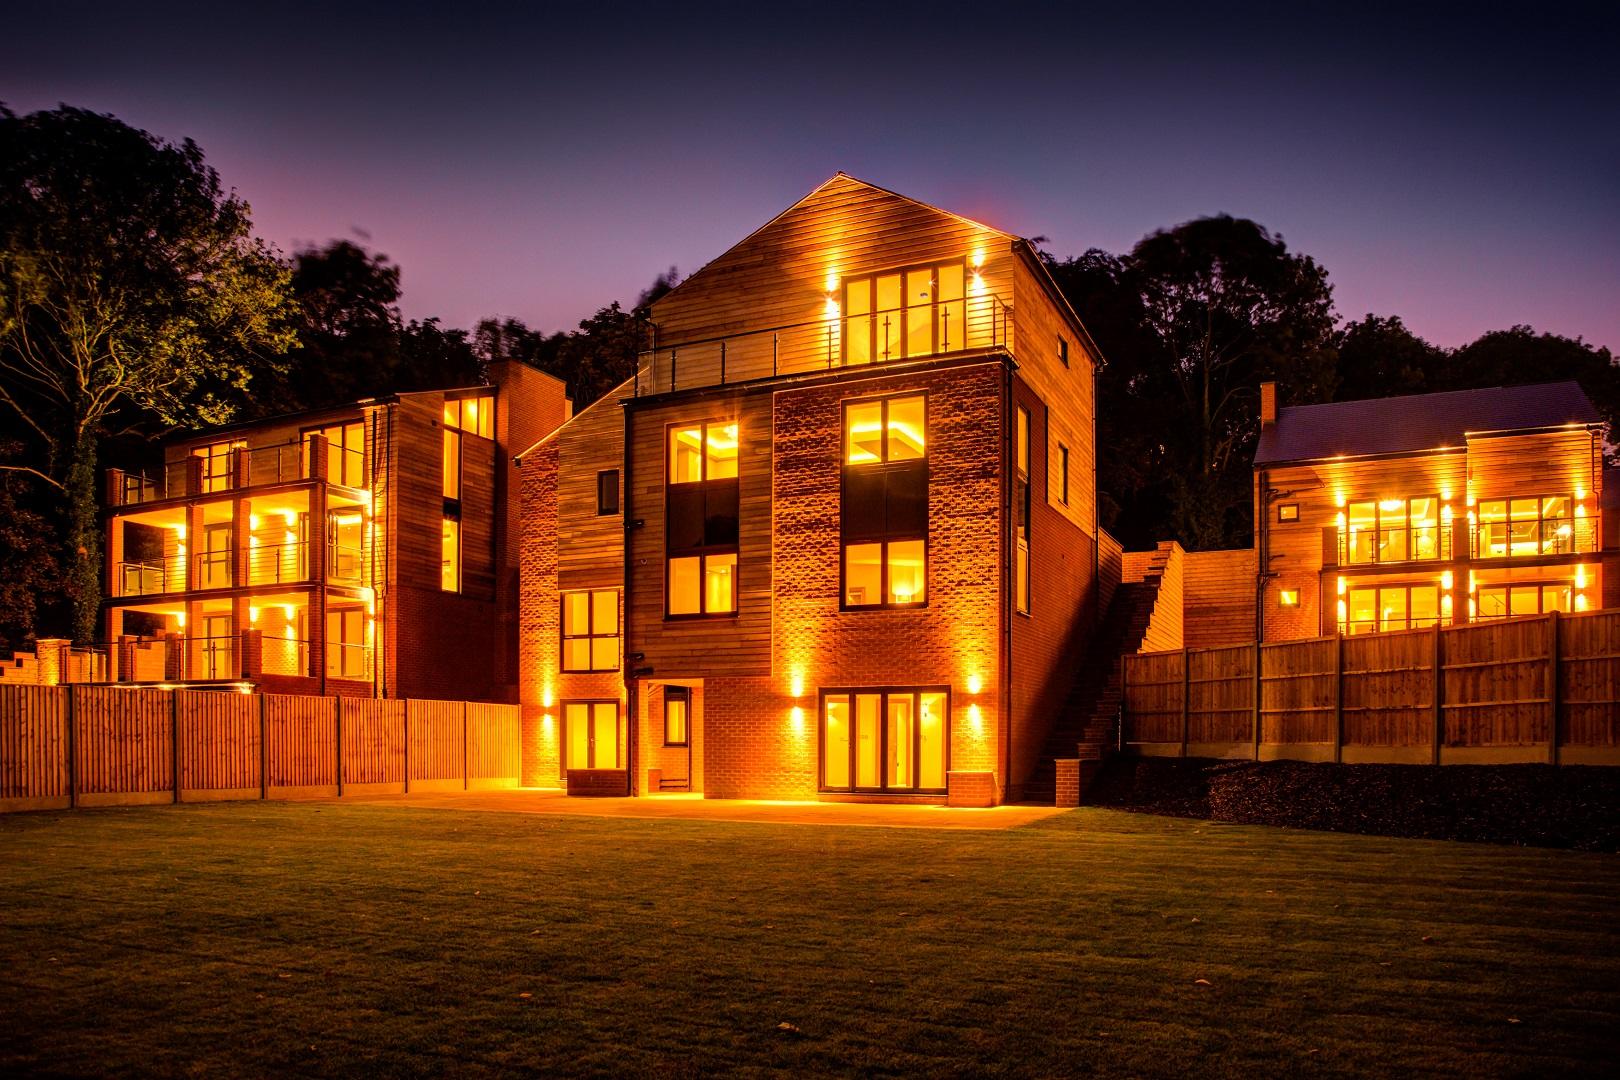 luxury housing development, nottingham, The Crescent, outdoor lighting